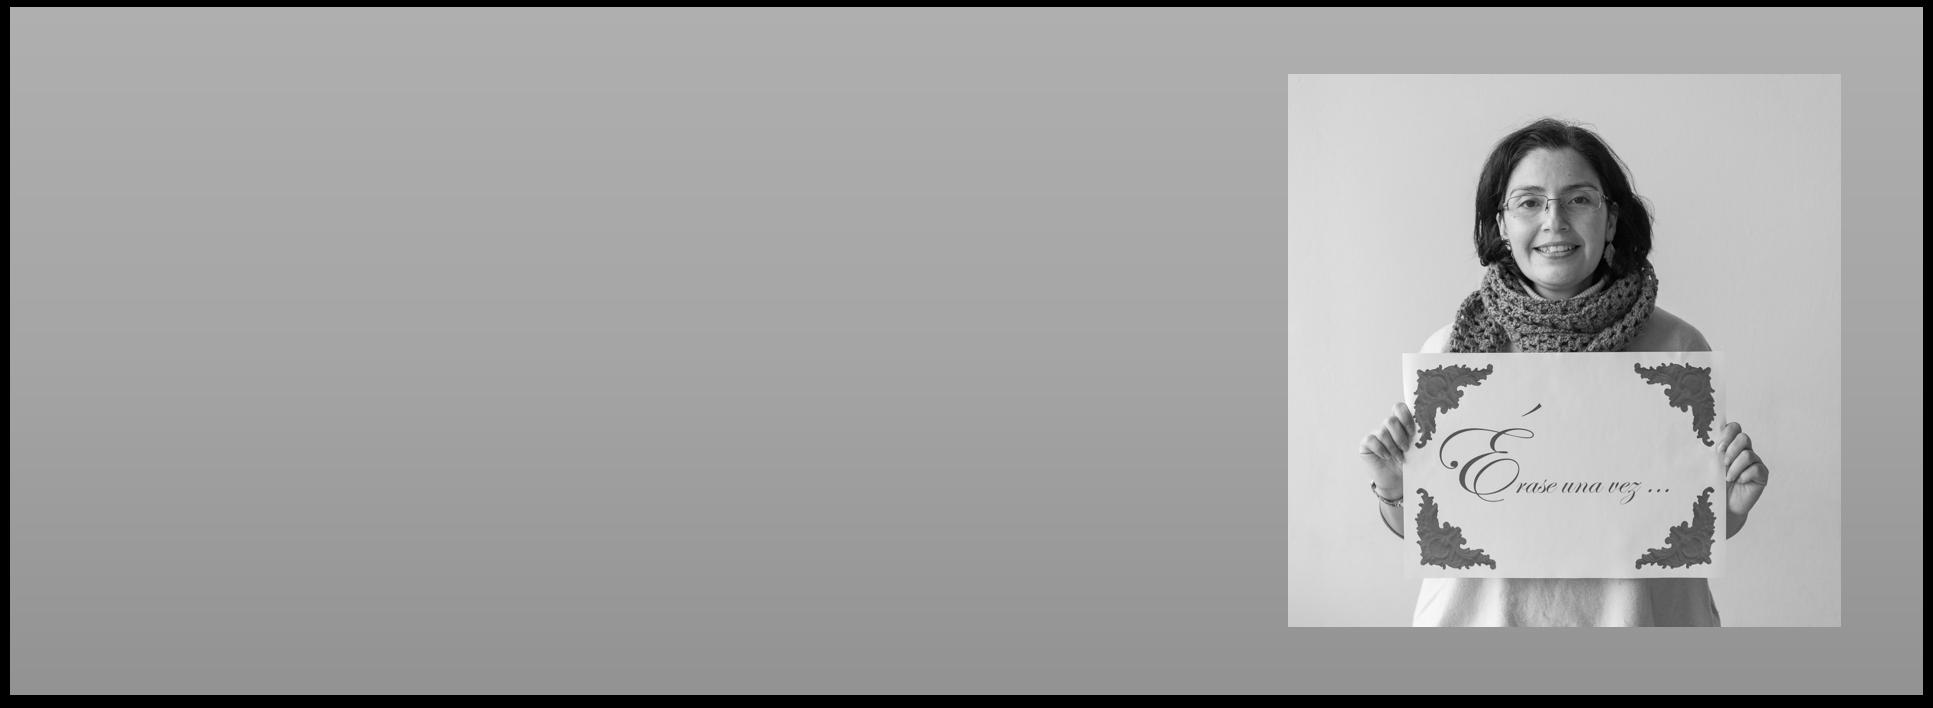 Pame banner